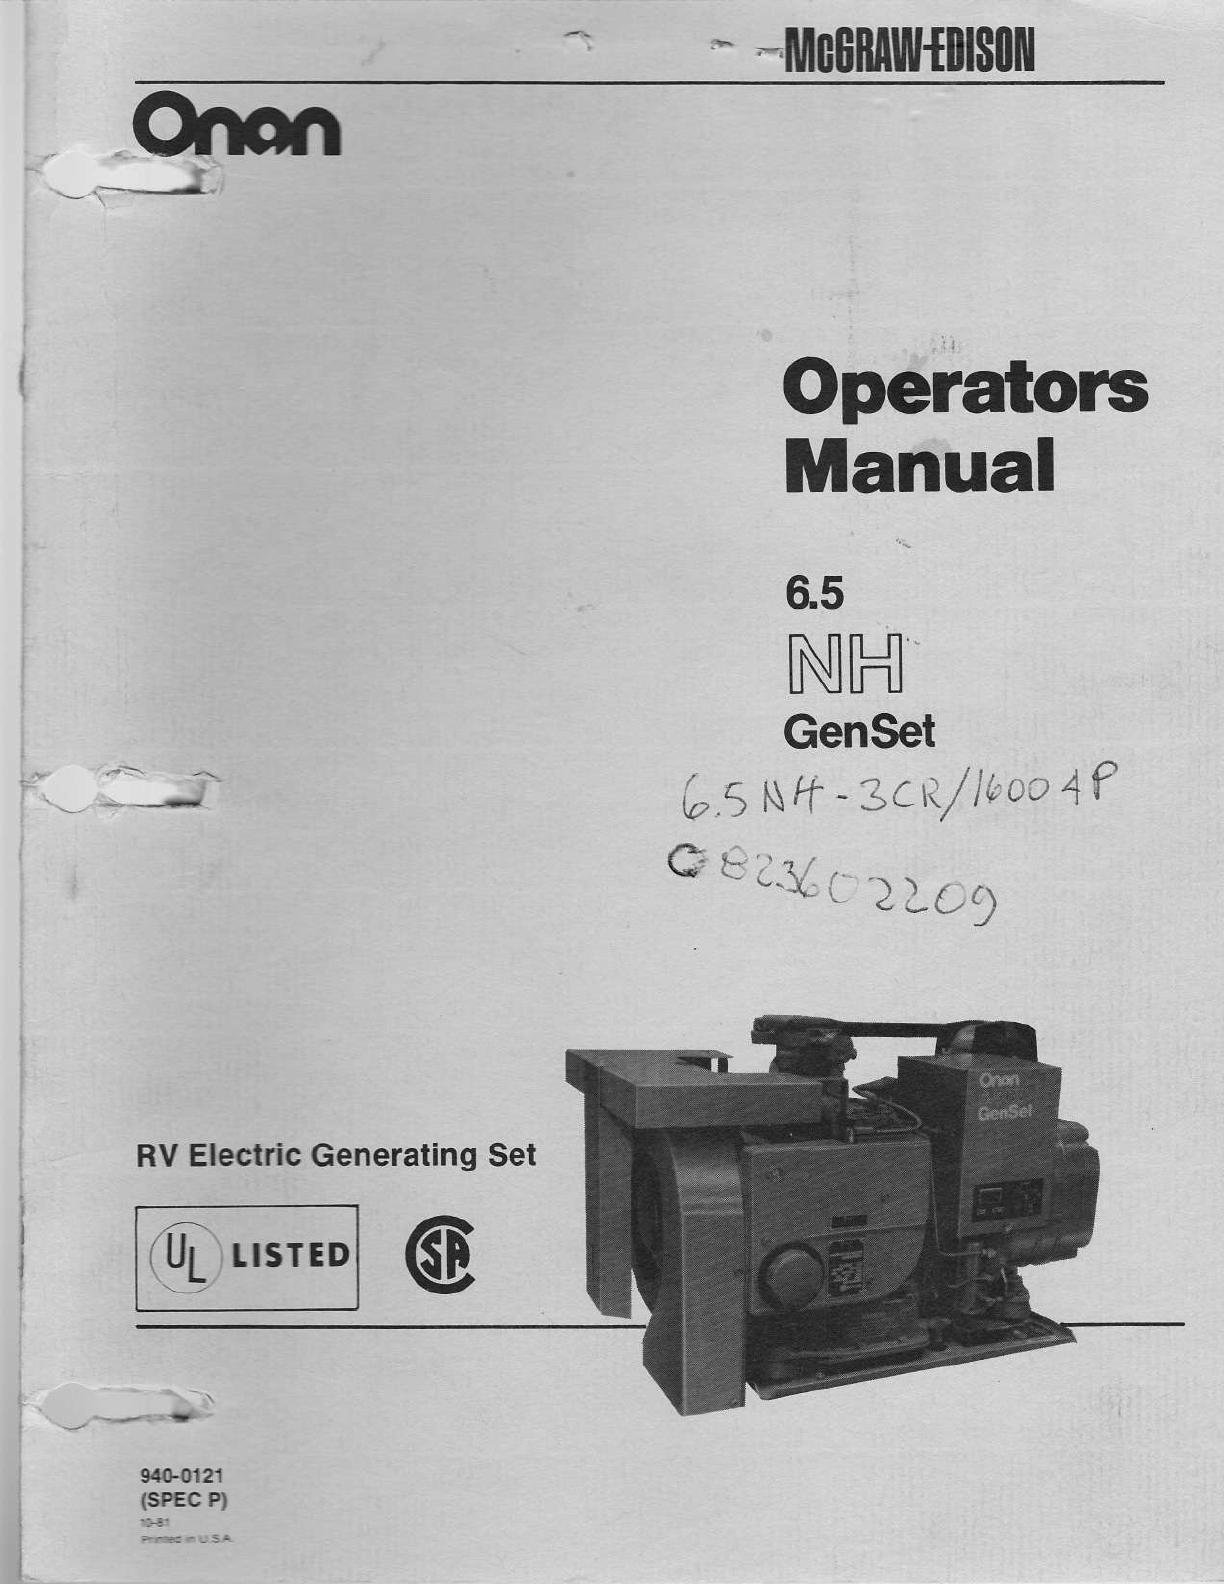 940 0121 Onan 6 5NH (spec P) RV Genset Operations Manual (10